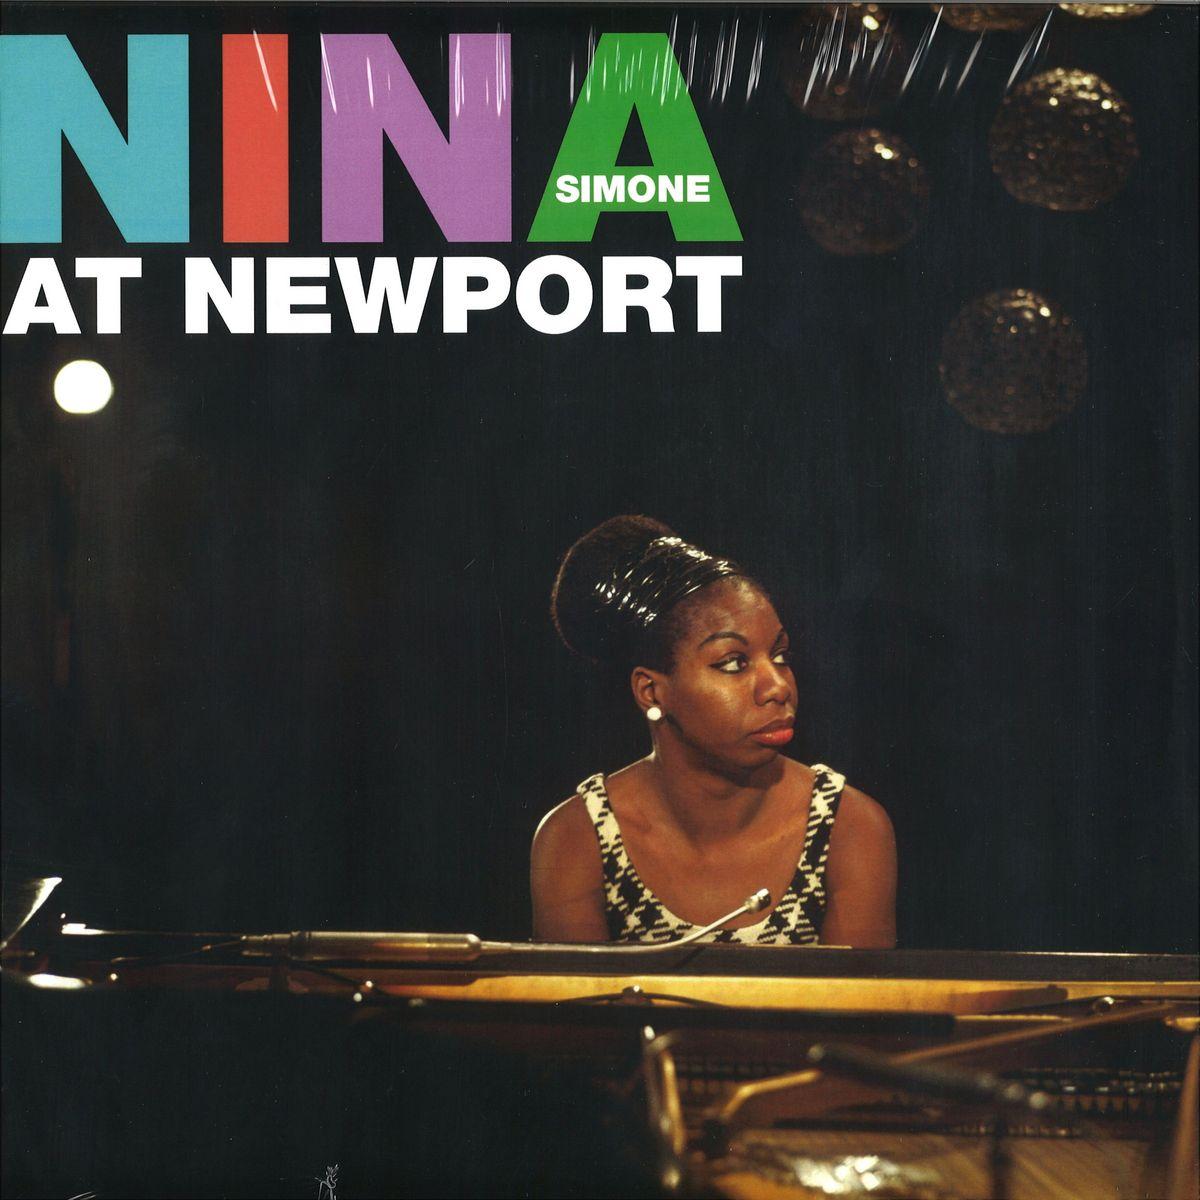 Simone, Nina Nina At Newport  Vinyl